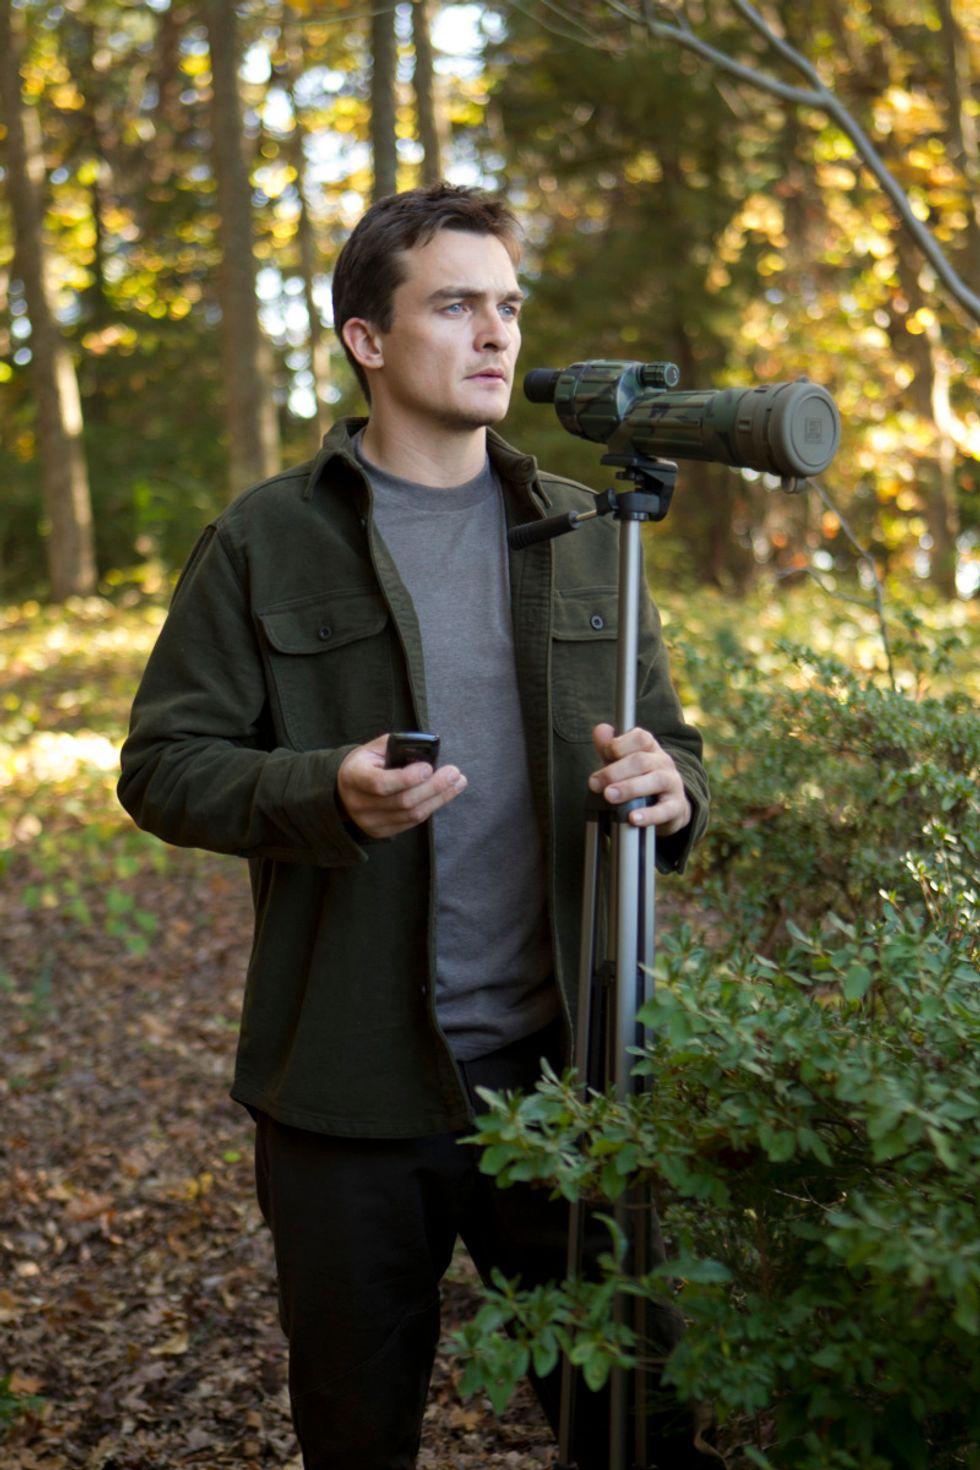 Rupert Friend behind a telescope in the woods.